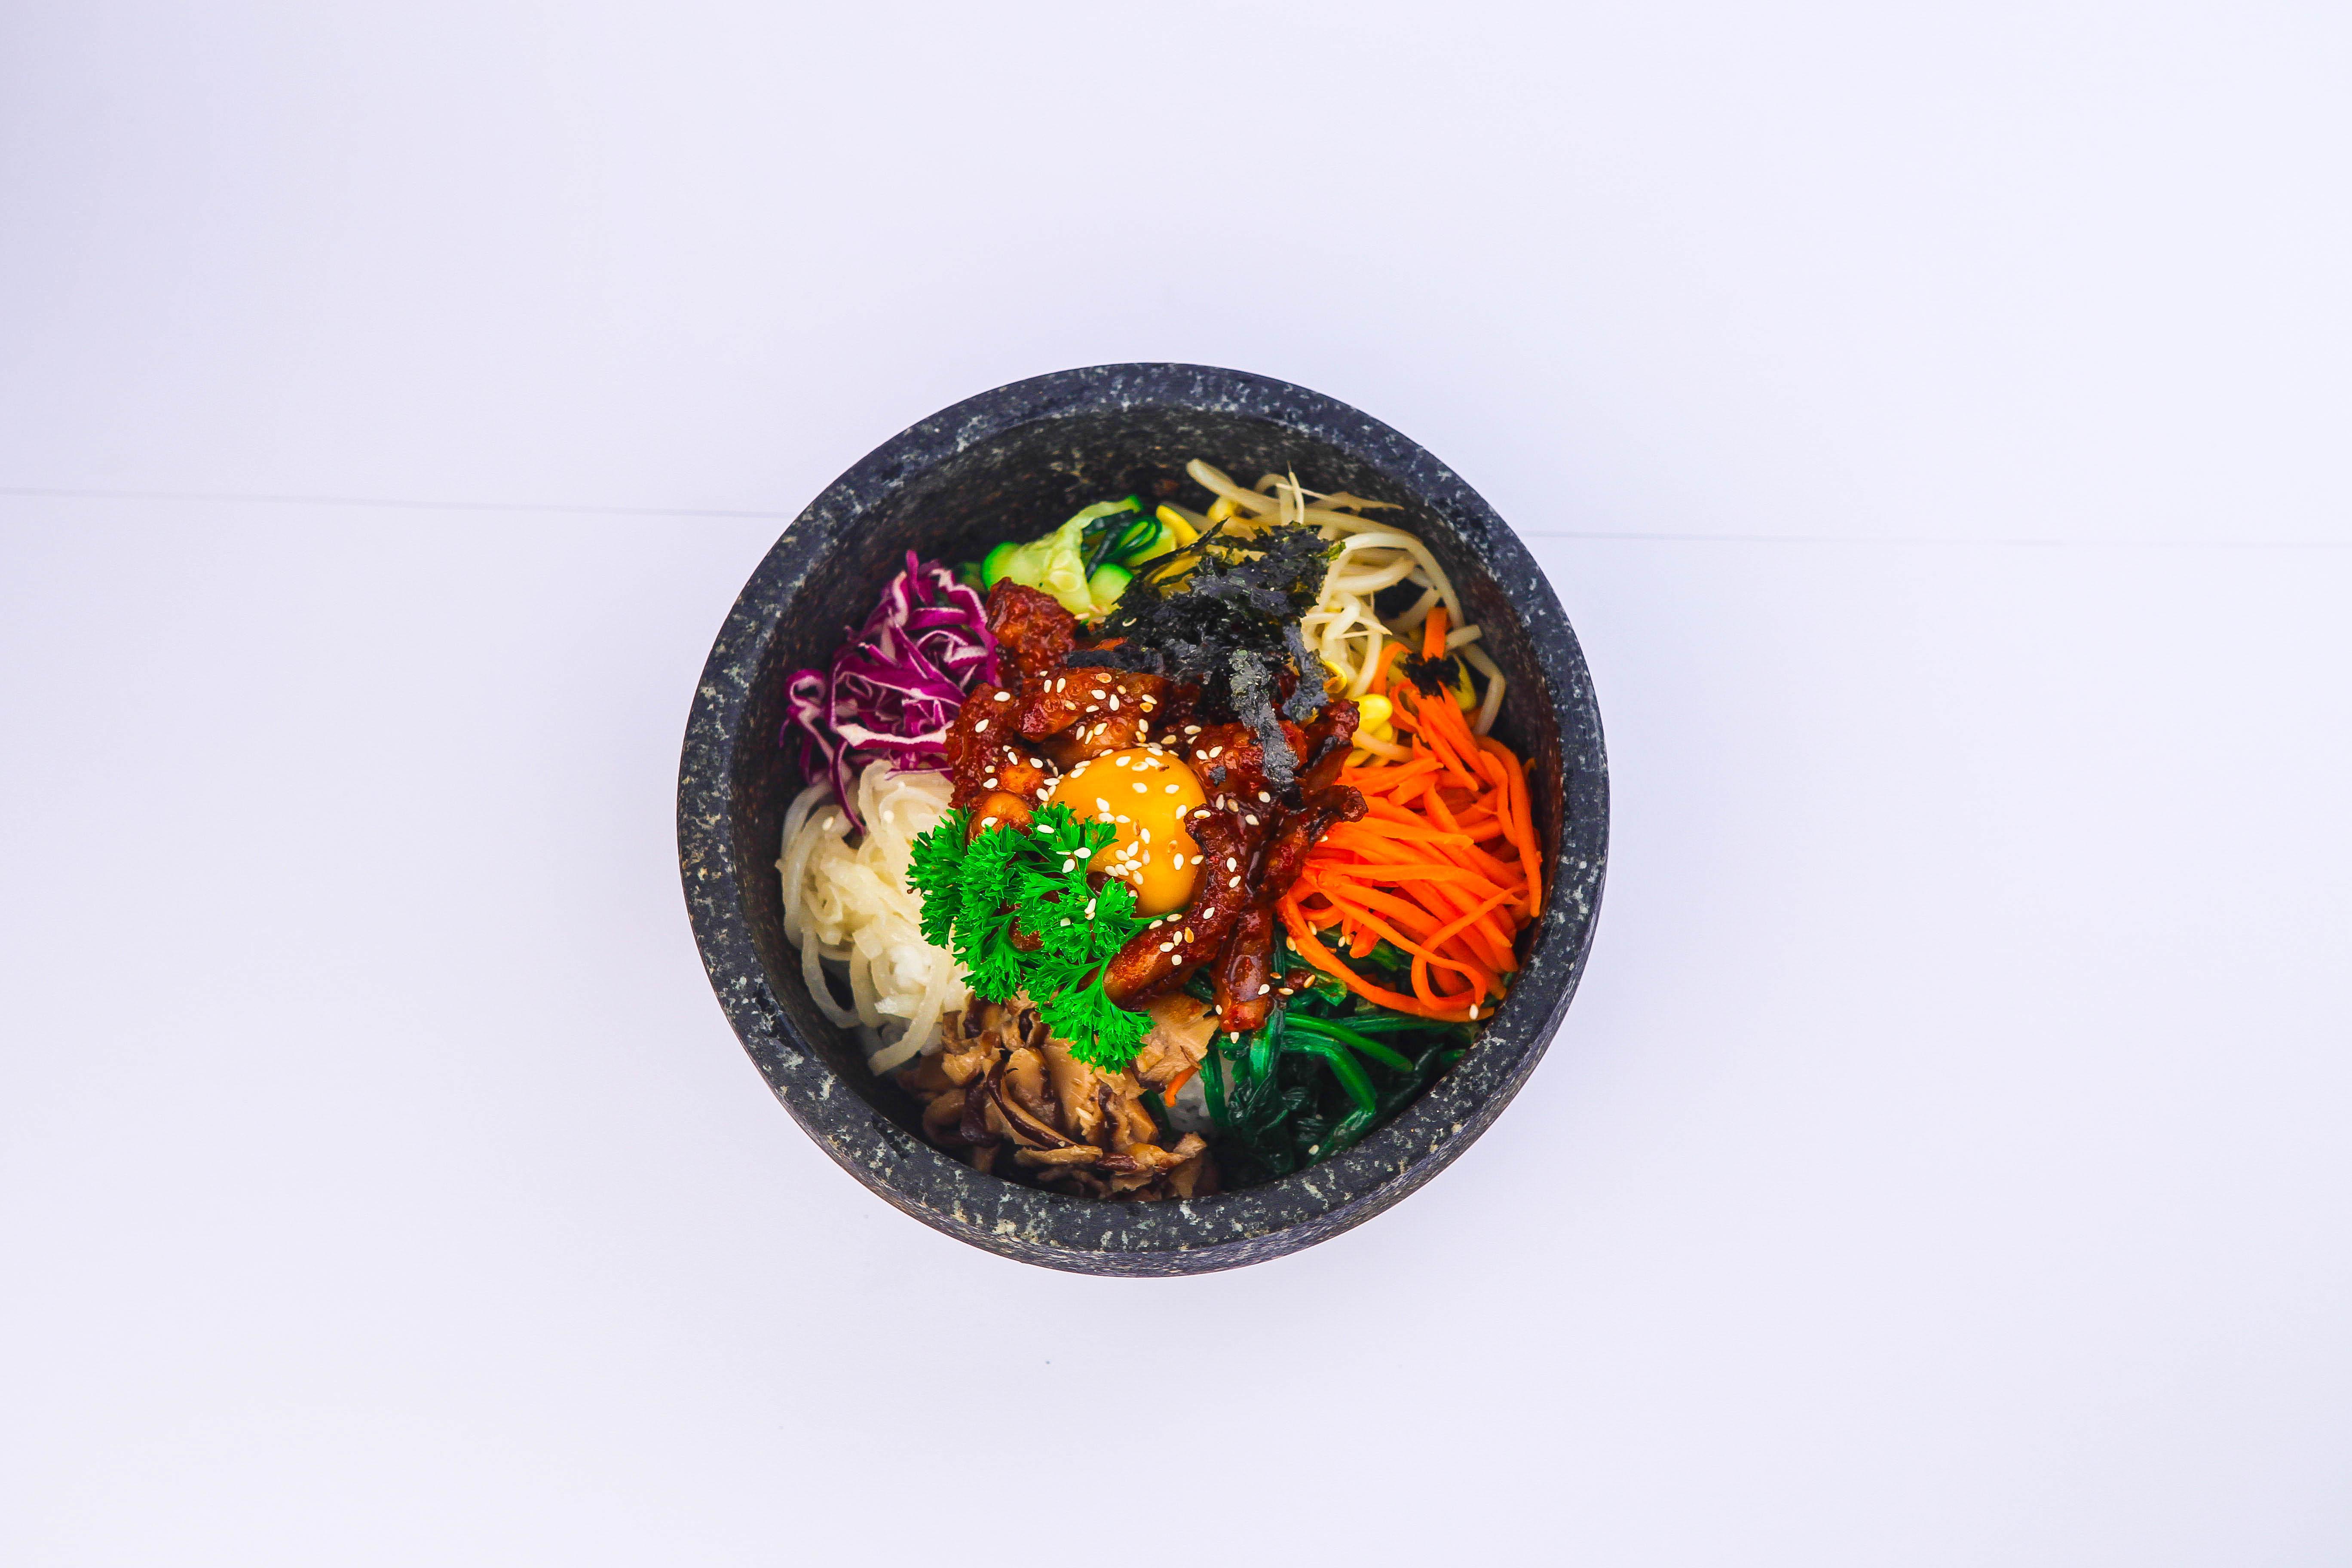 liquor-licensed-korean-restaurant-chinatown-300k-profit-to-owner-8